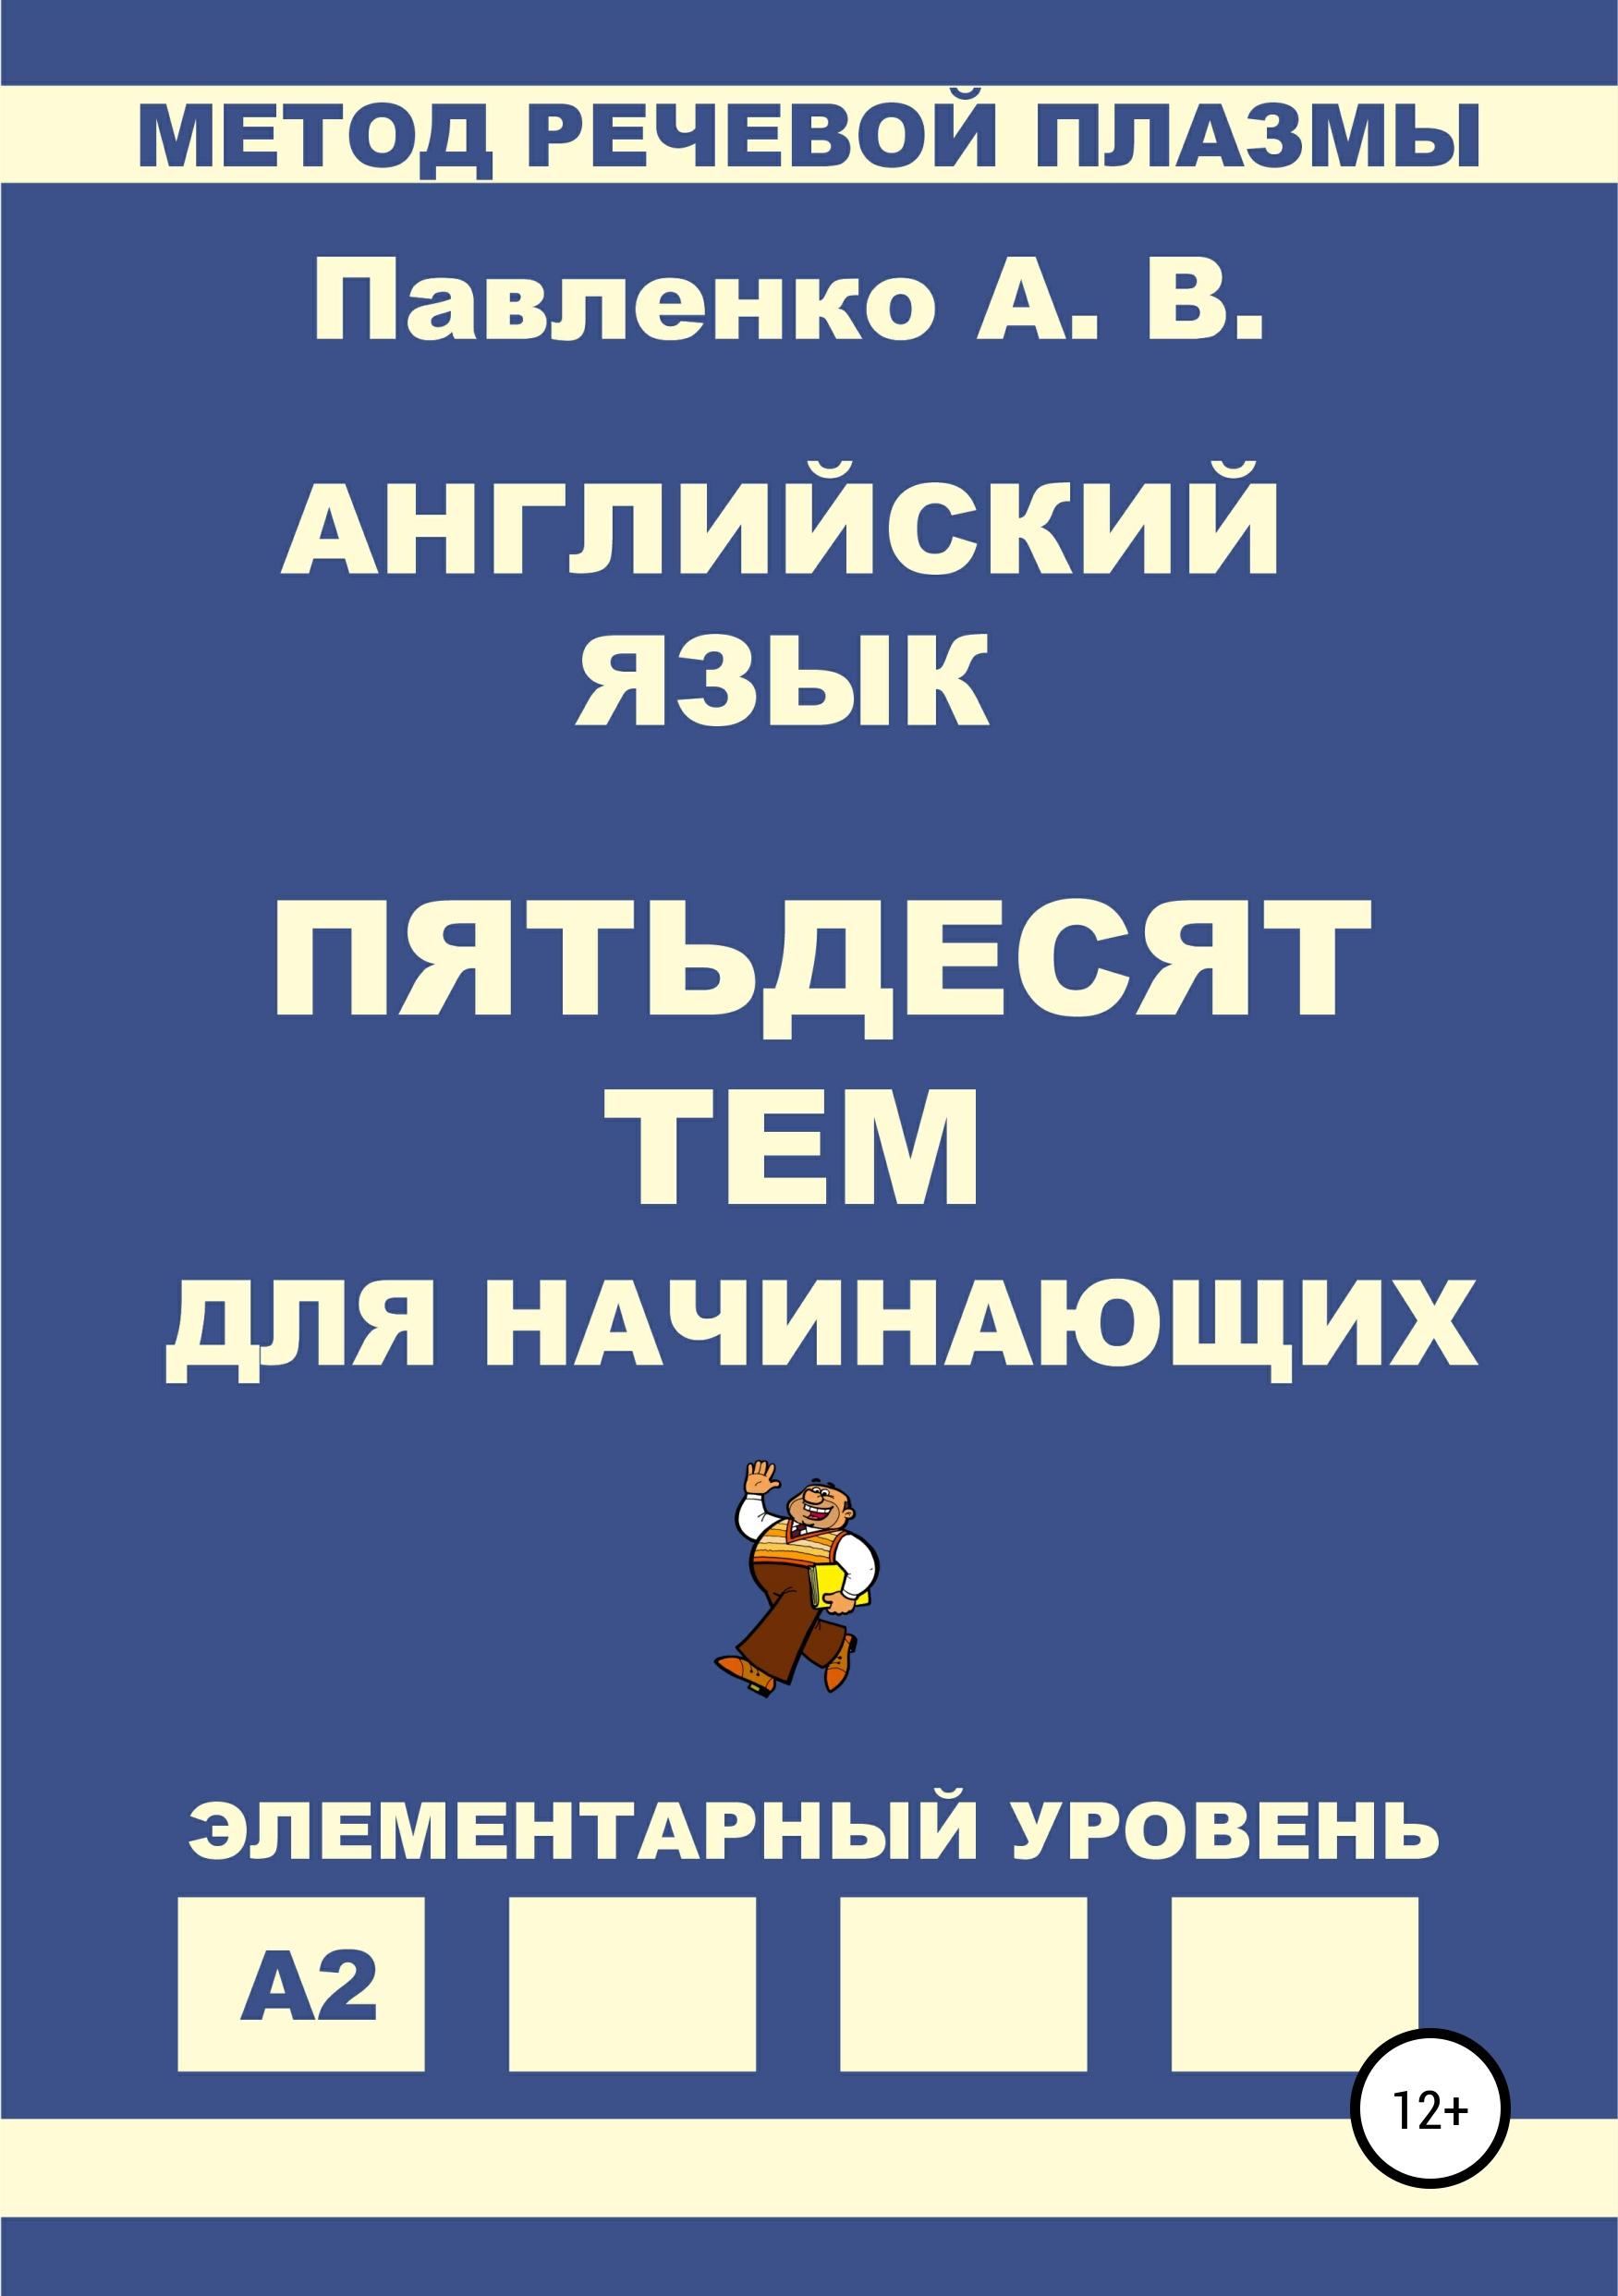 Взять кредит онлайн быстро up-credit.ru